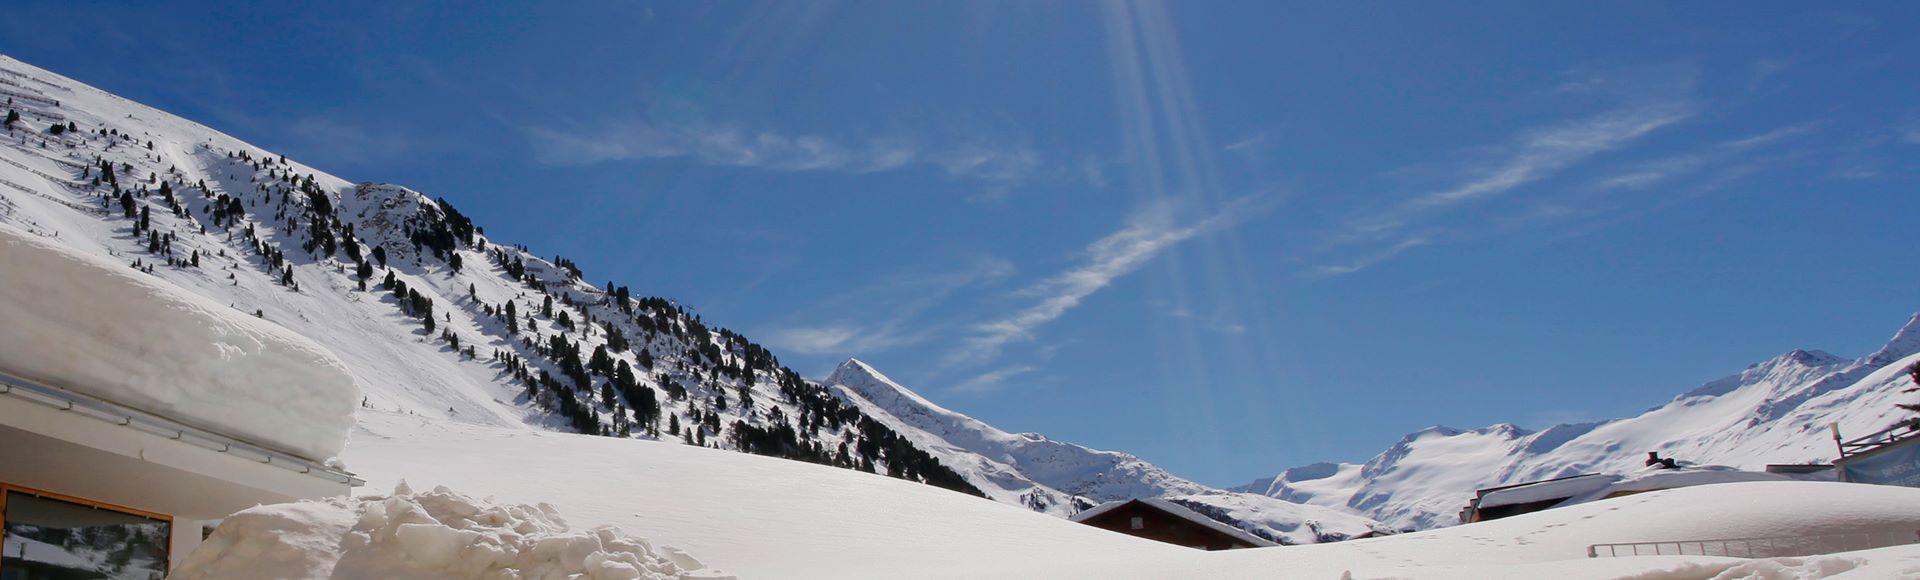 Skidresor Till Obergurgl I  U00d6sterrike